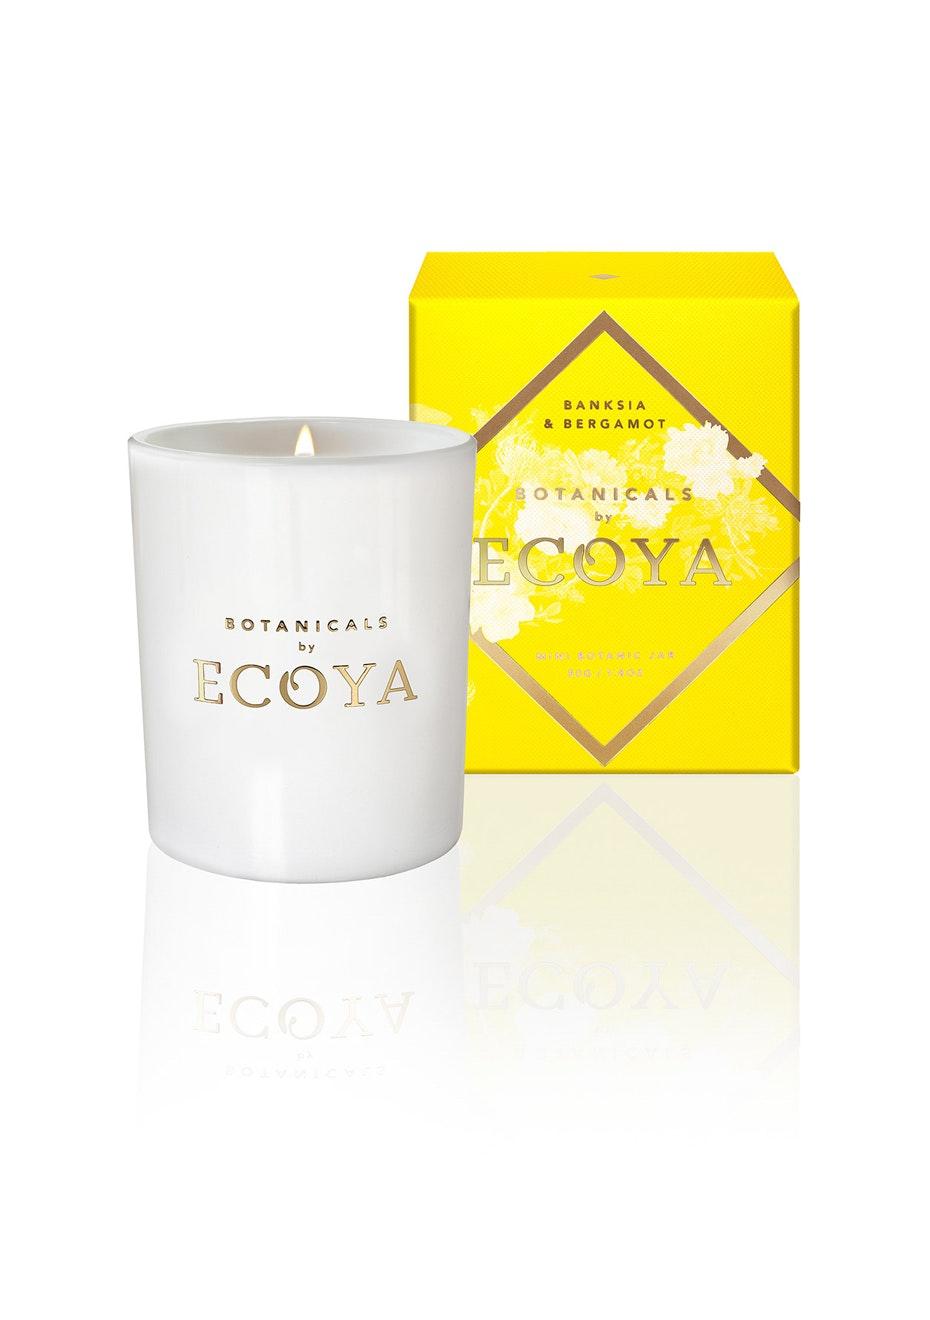 Ecoya - Mini Botanic - Banskia & Bergamot